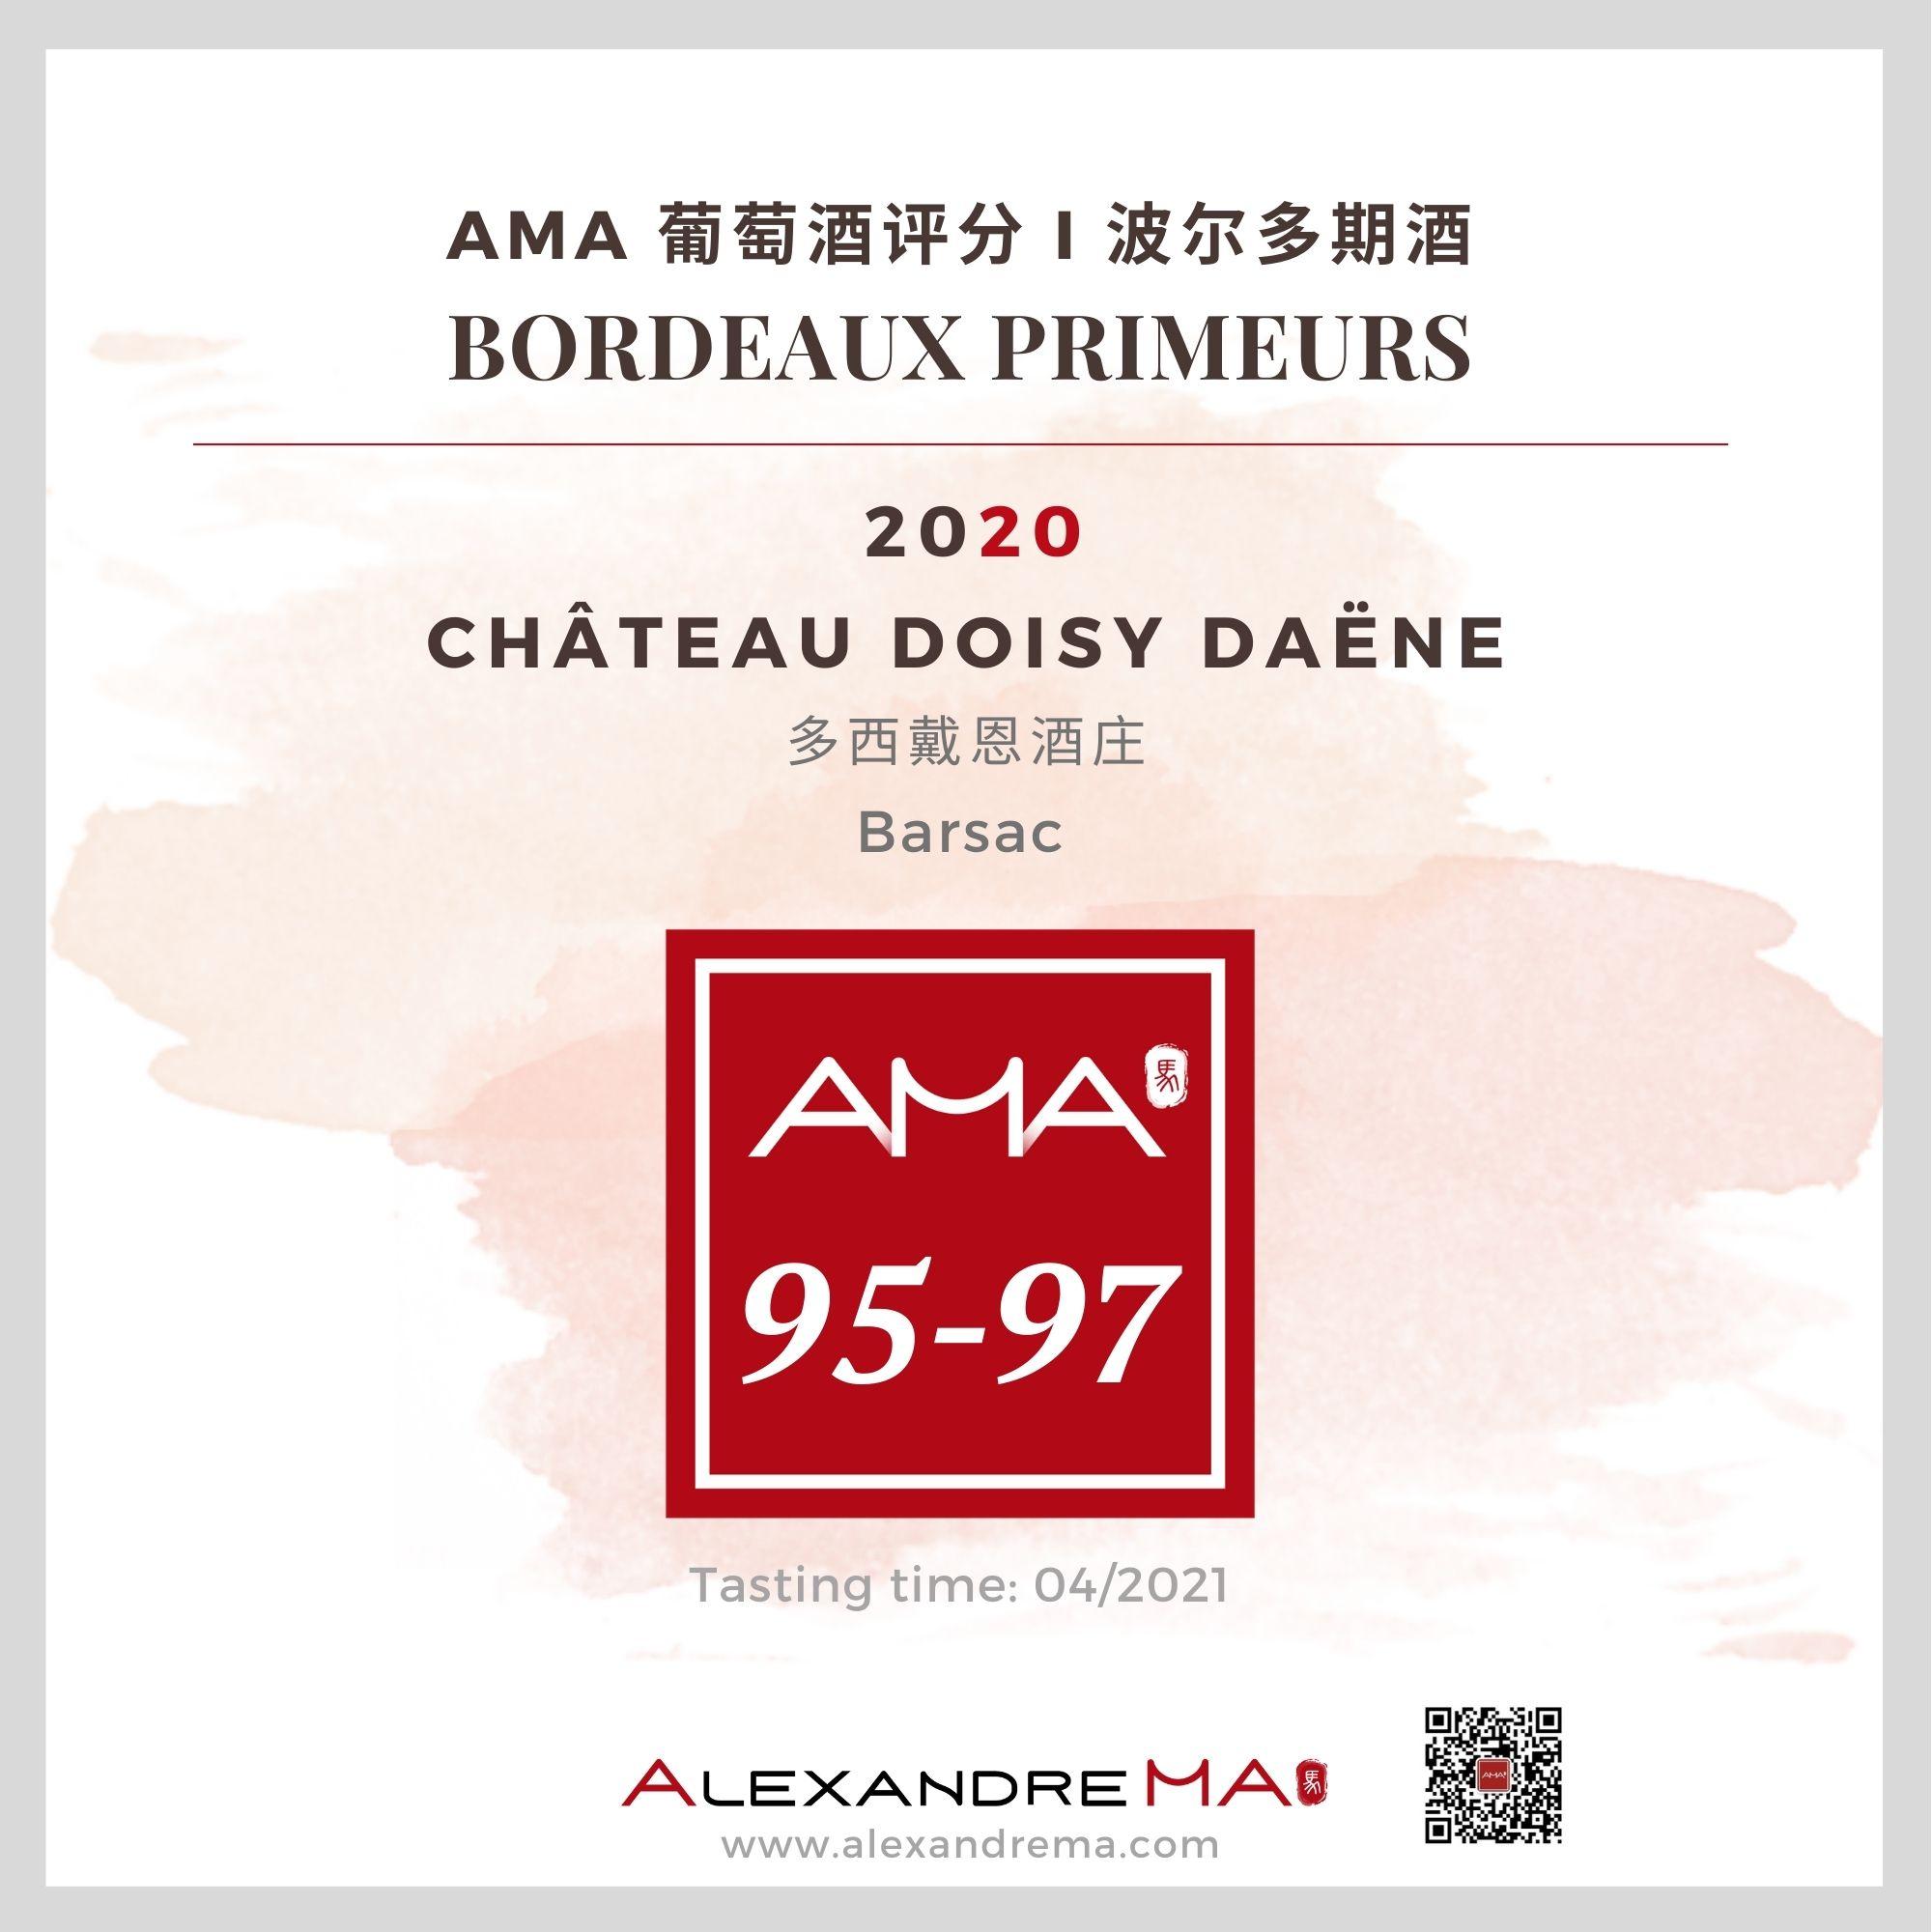 Château Doisy Daëne 2020 多西戴恩酒庄 - Alexandre Ma